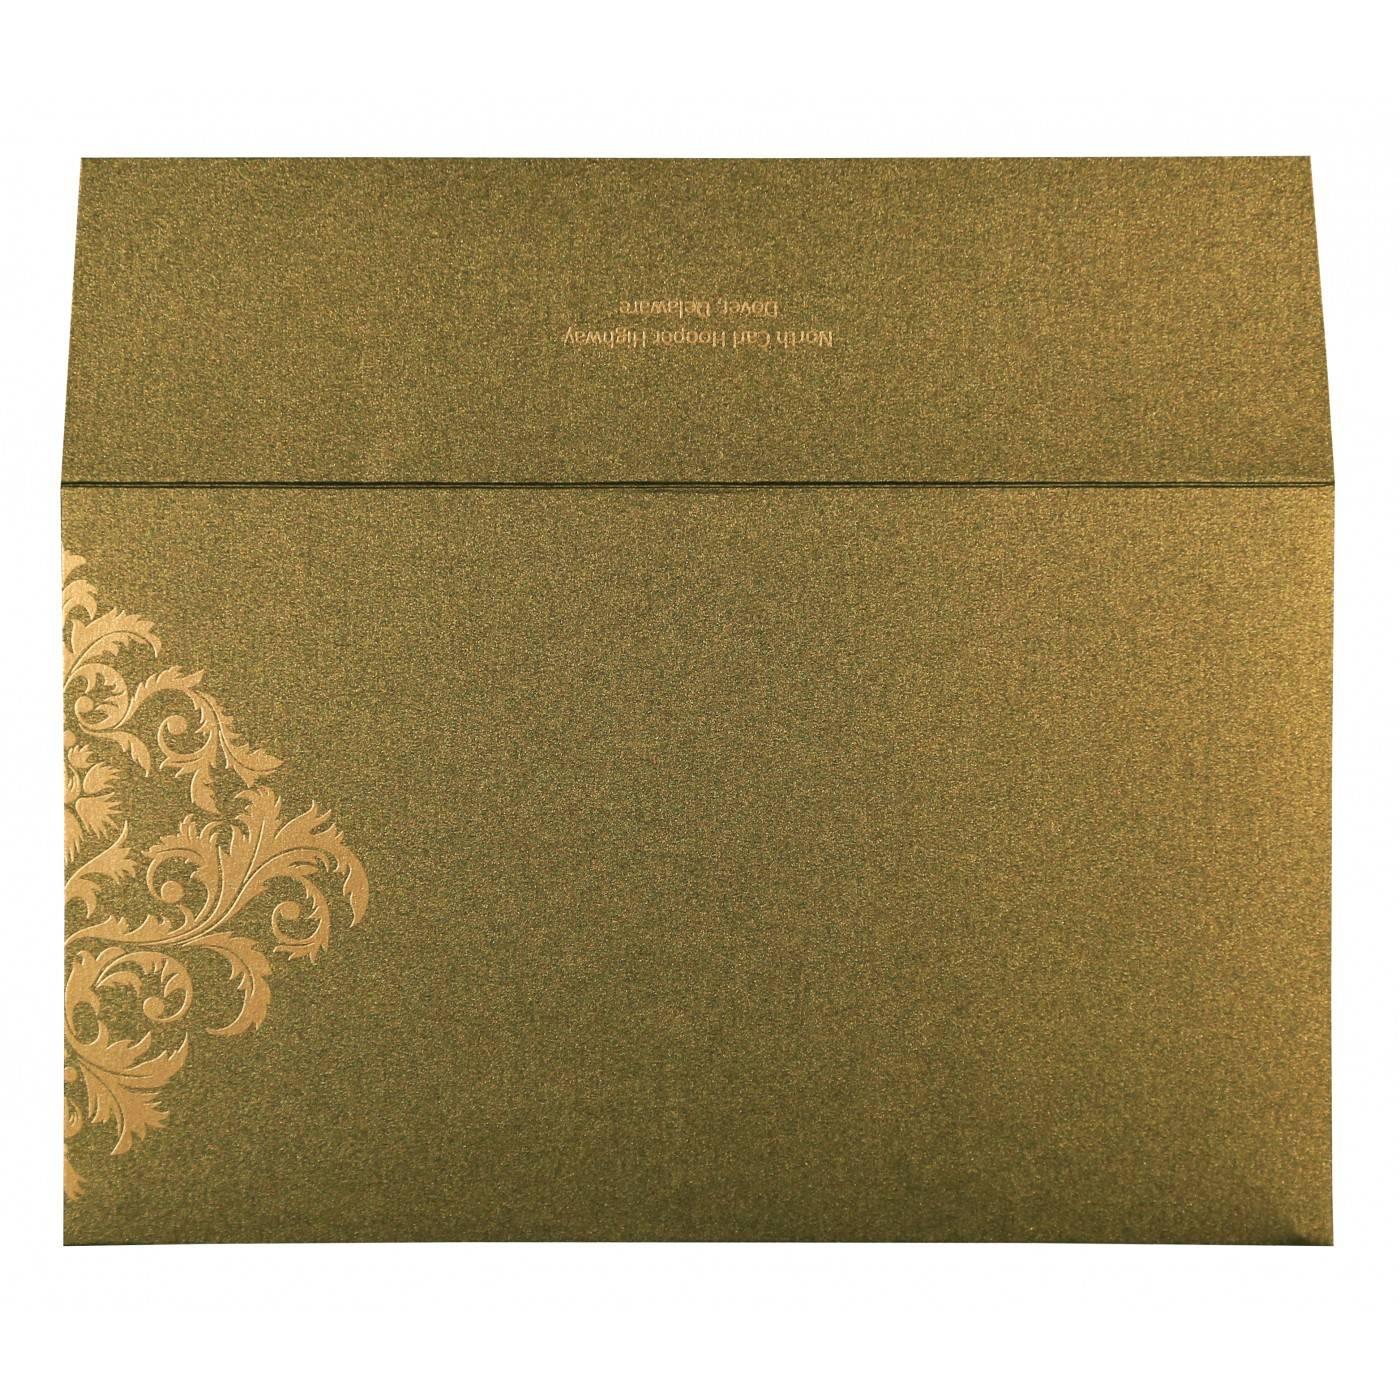 DEEP SAGE SHIMMERY DAMASK THEMED - SCREEN PRINTED WEDDING CARD : CD-8257A - IndianWeddingCards